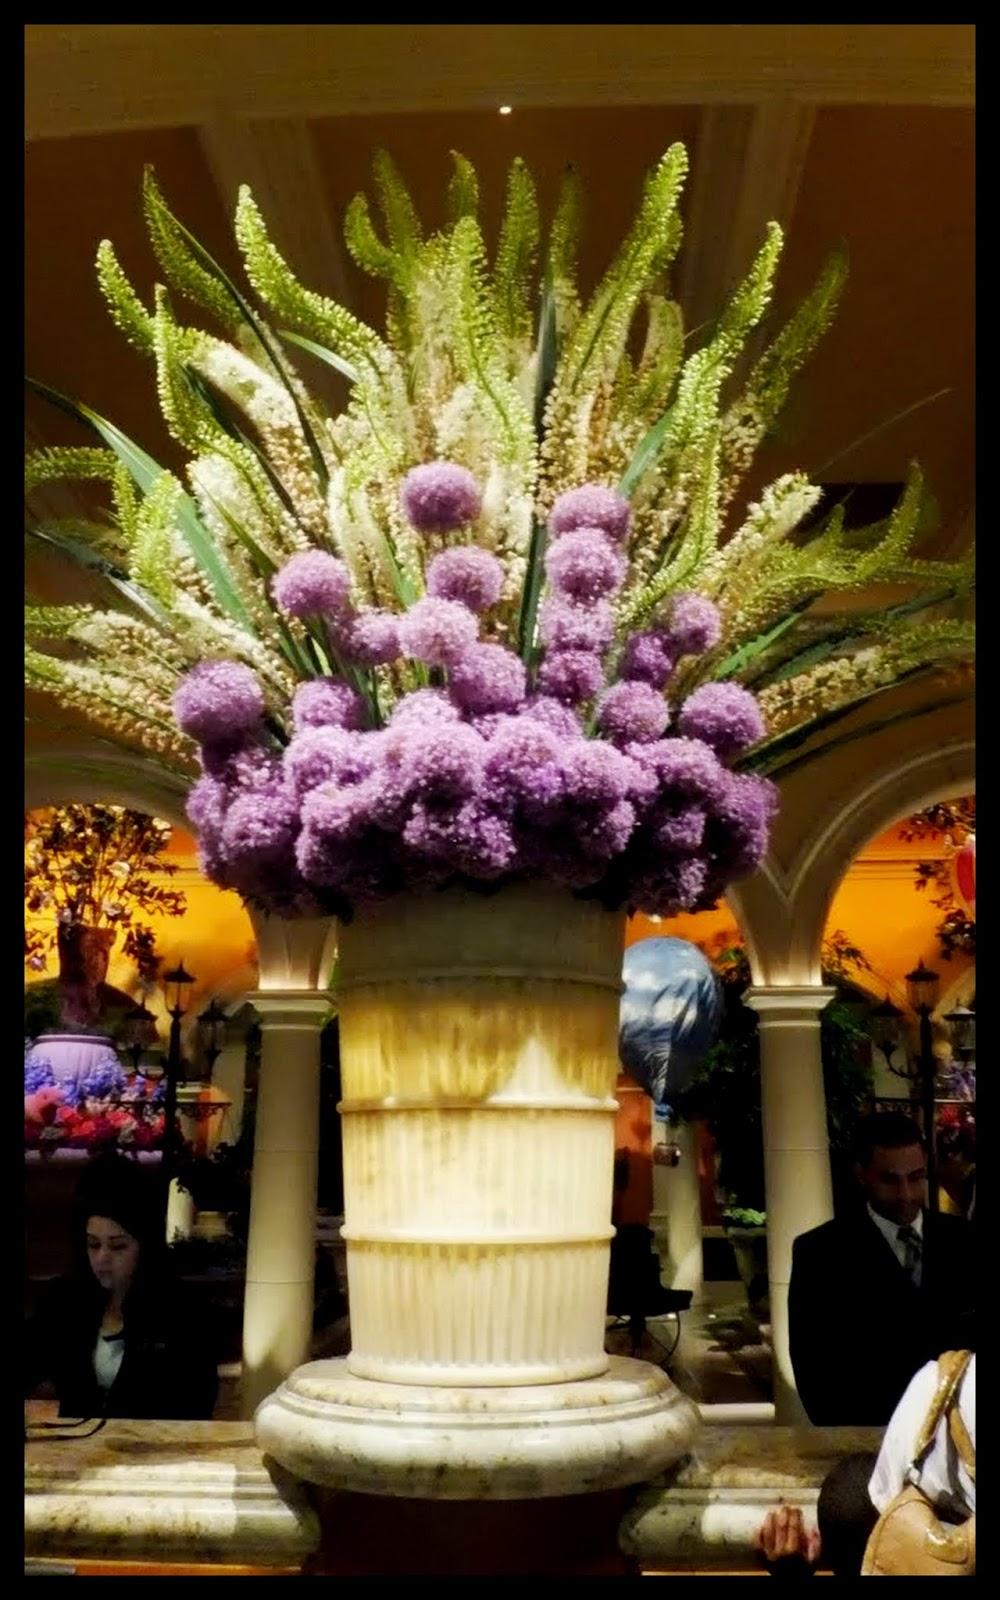 Blooming Ideas: Blog: AIFD Symposium Las Vegas 2013